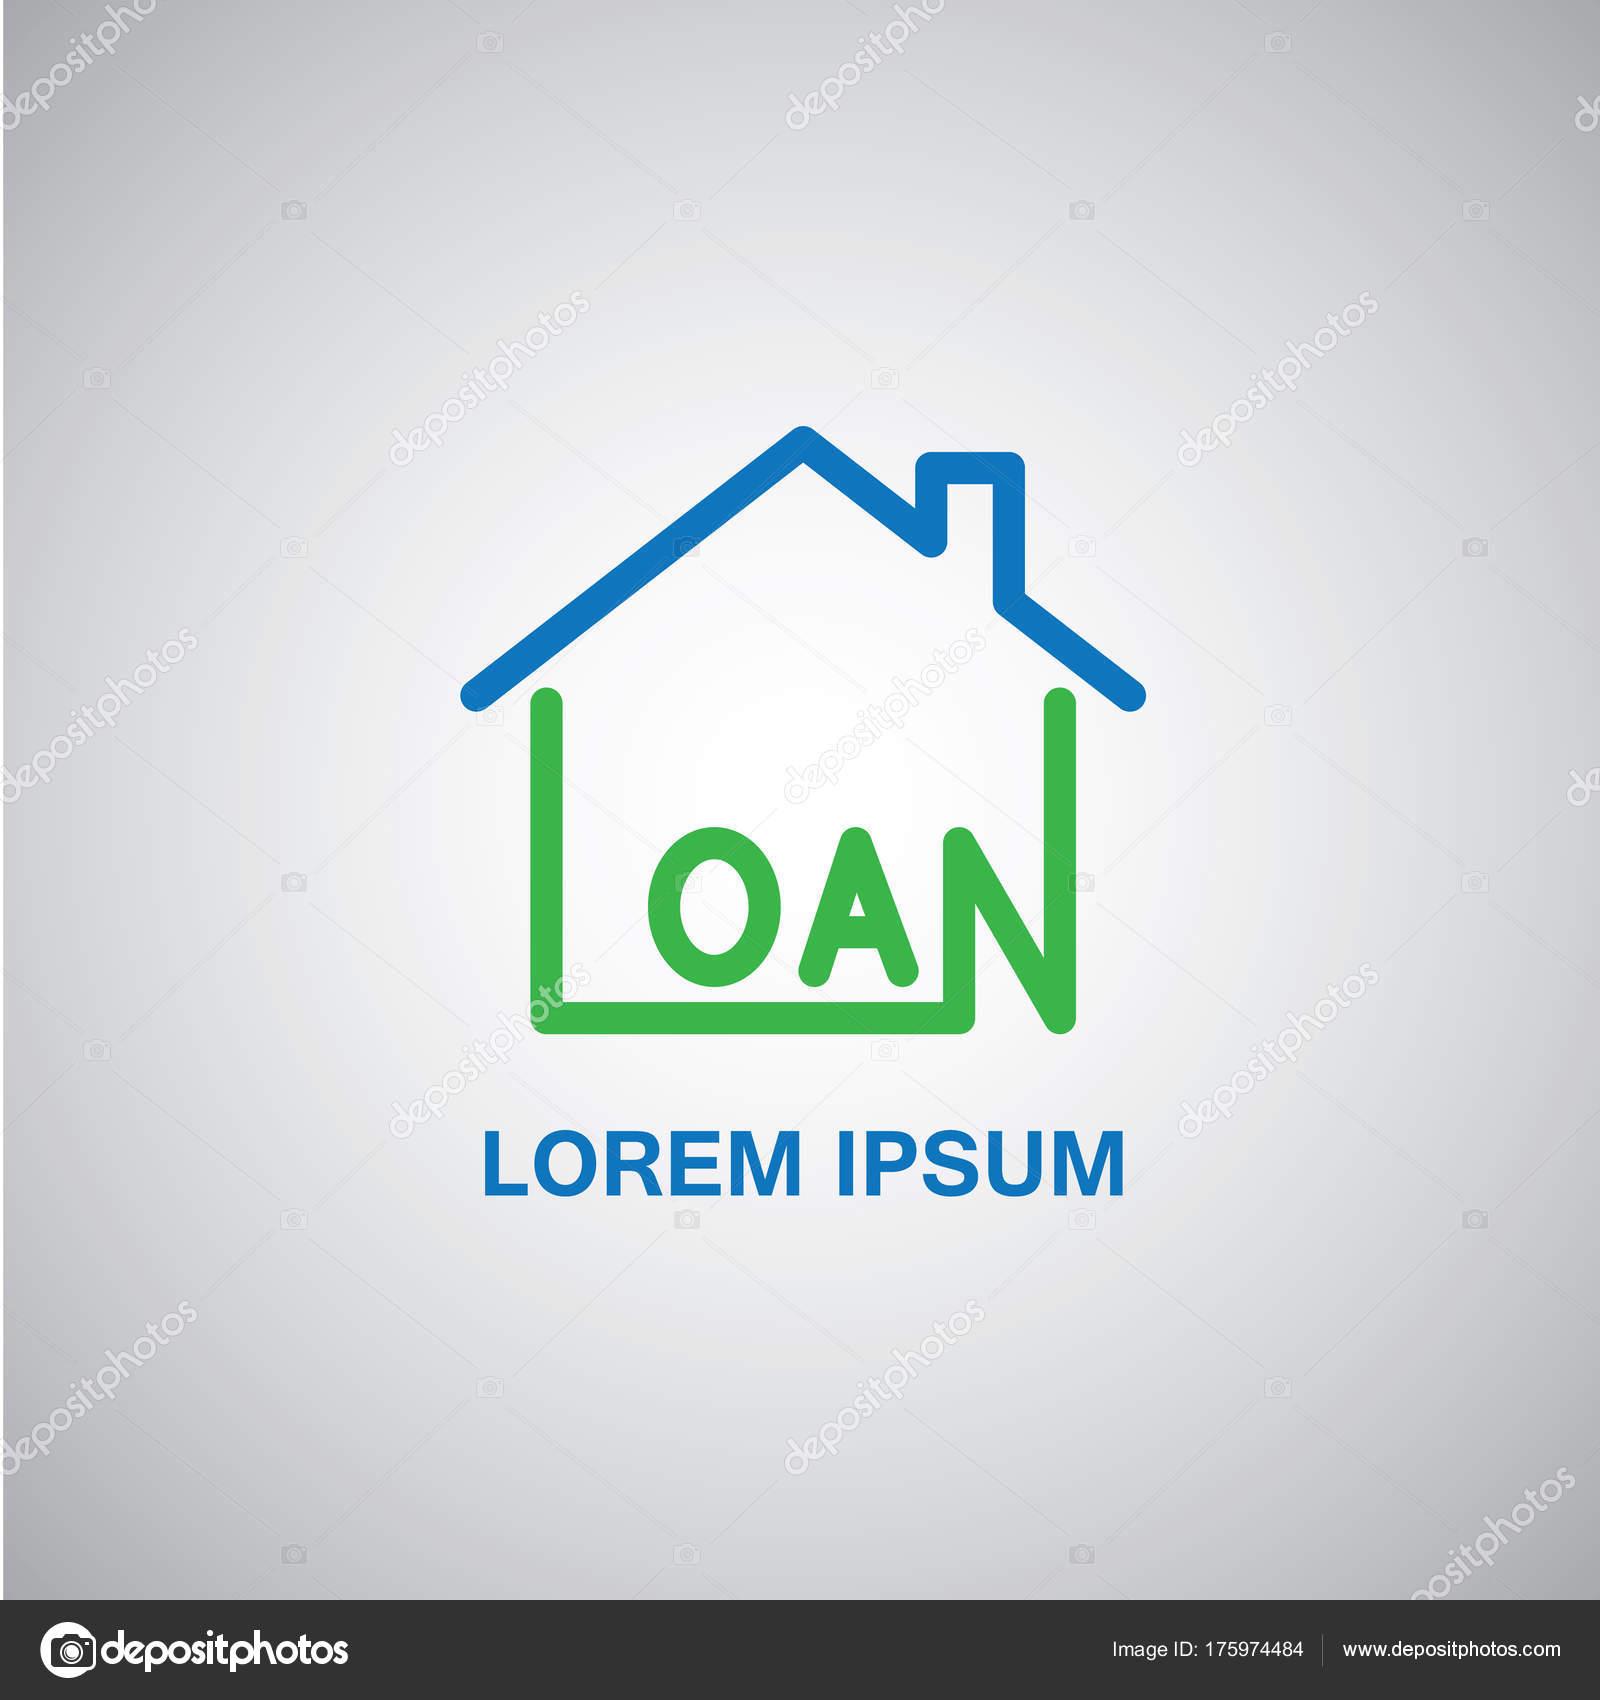 Images: loan logo | House Home Financial Loan Logo Graphic ...